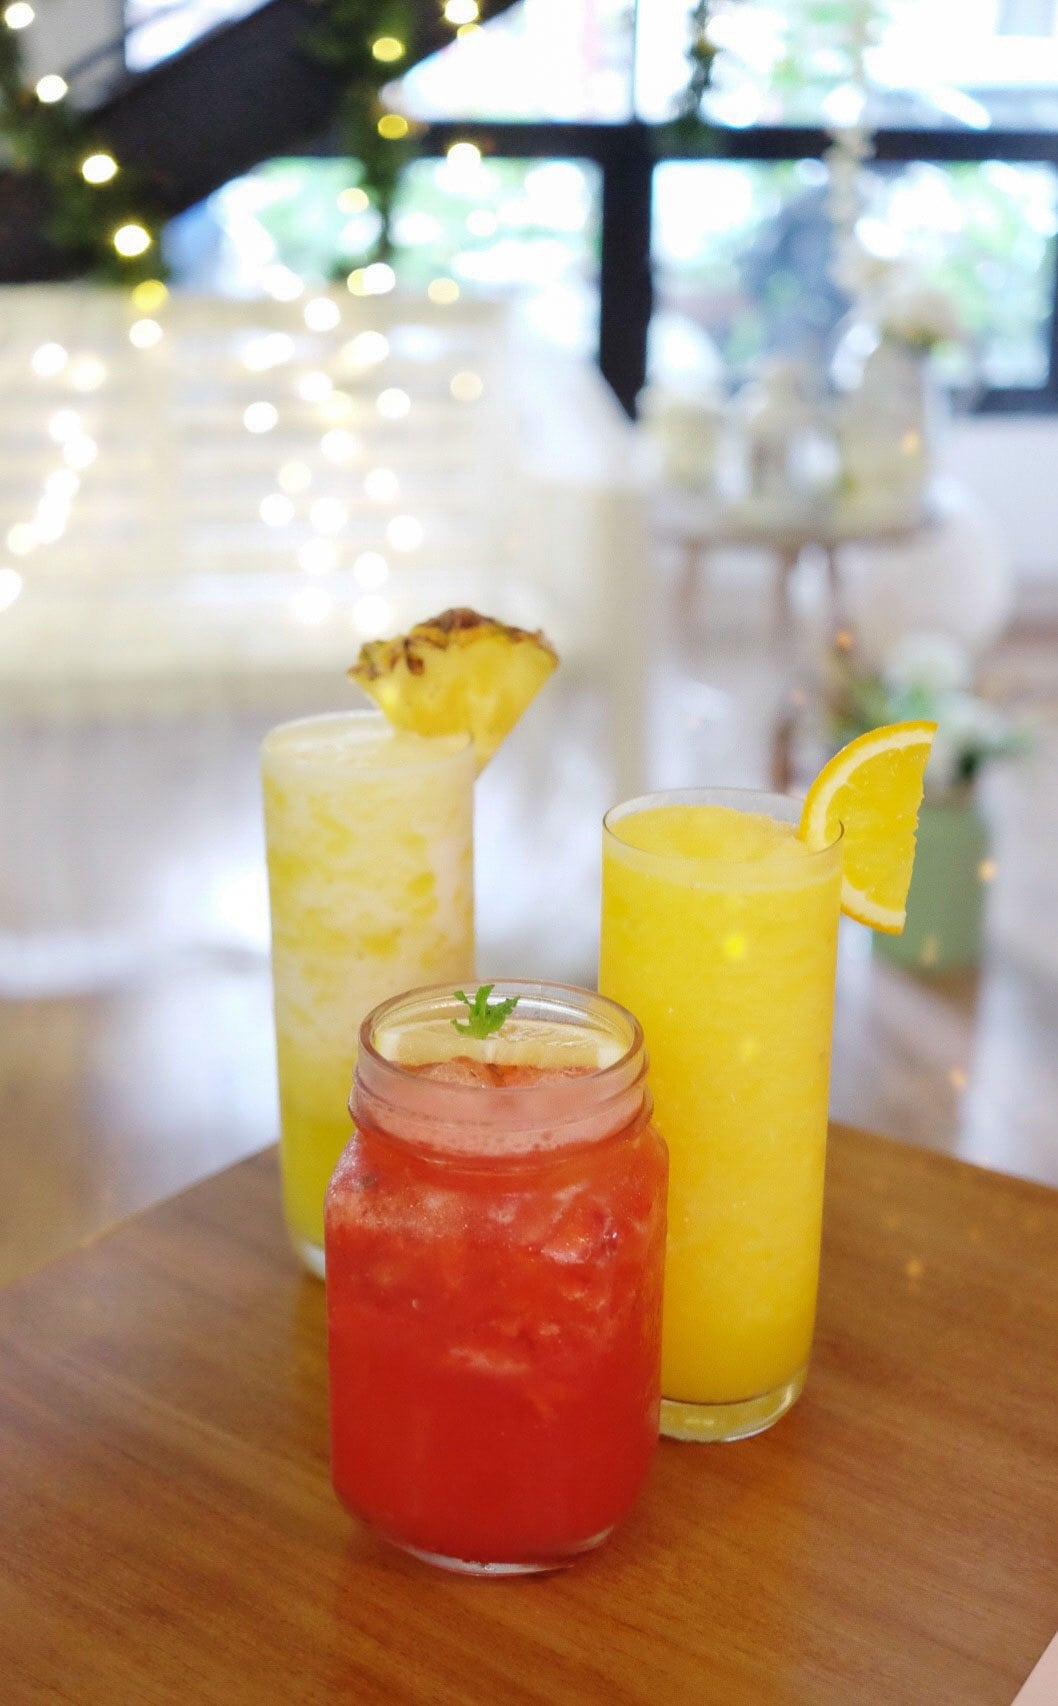 Strawberry Lemonade, Pineapple Juice & Orange Juice